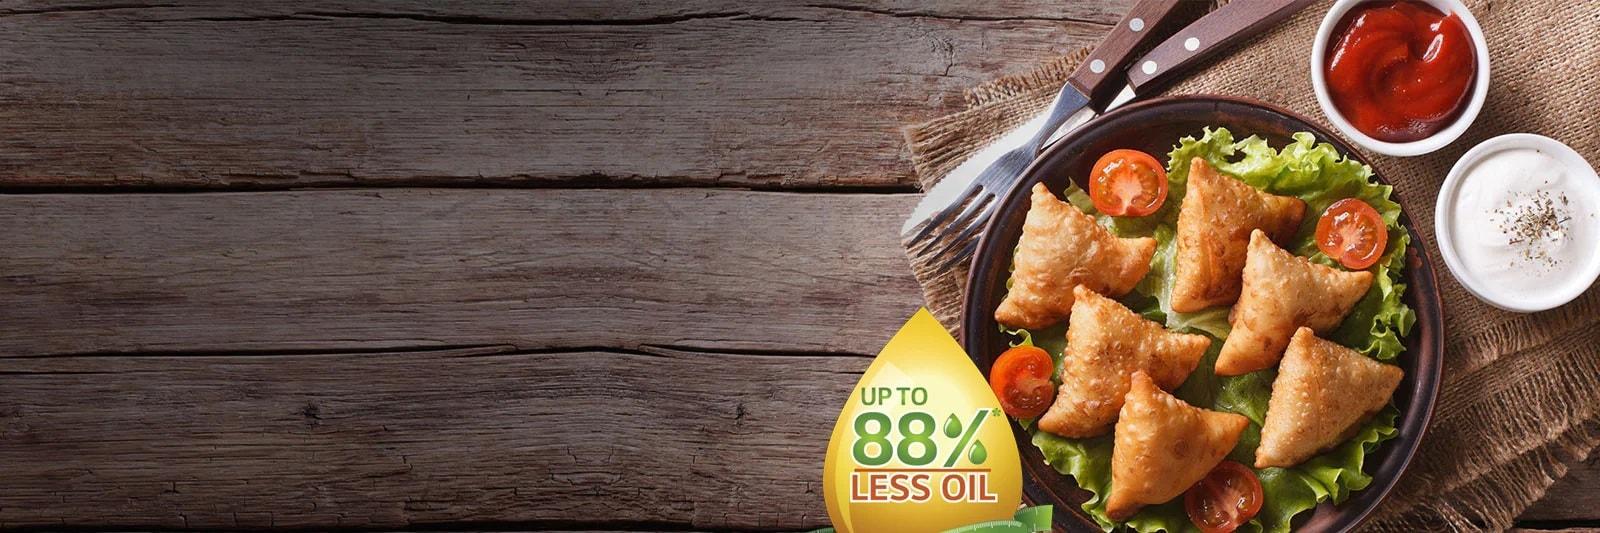 LG MC2886BHT Diet Fry